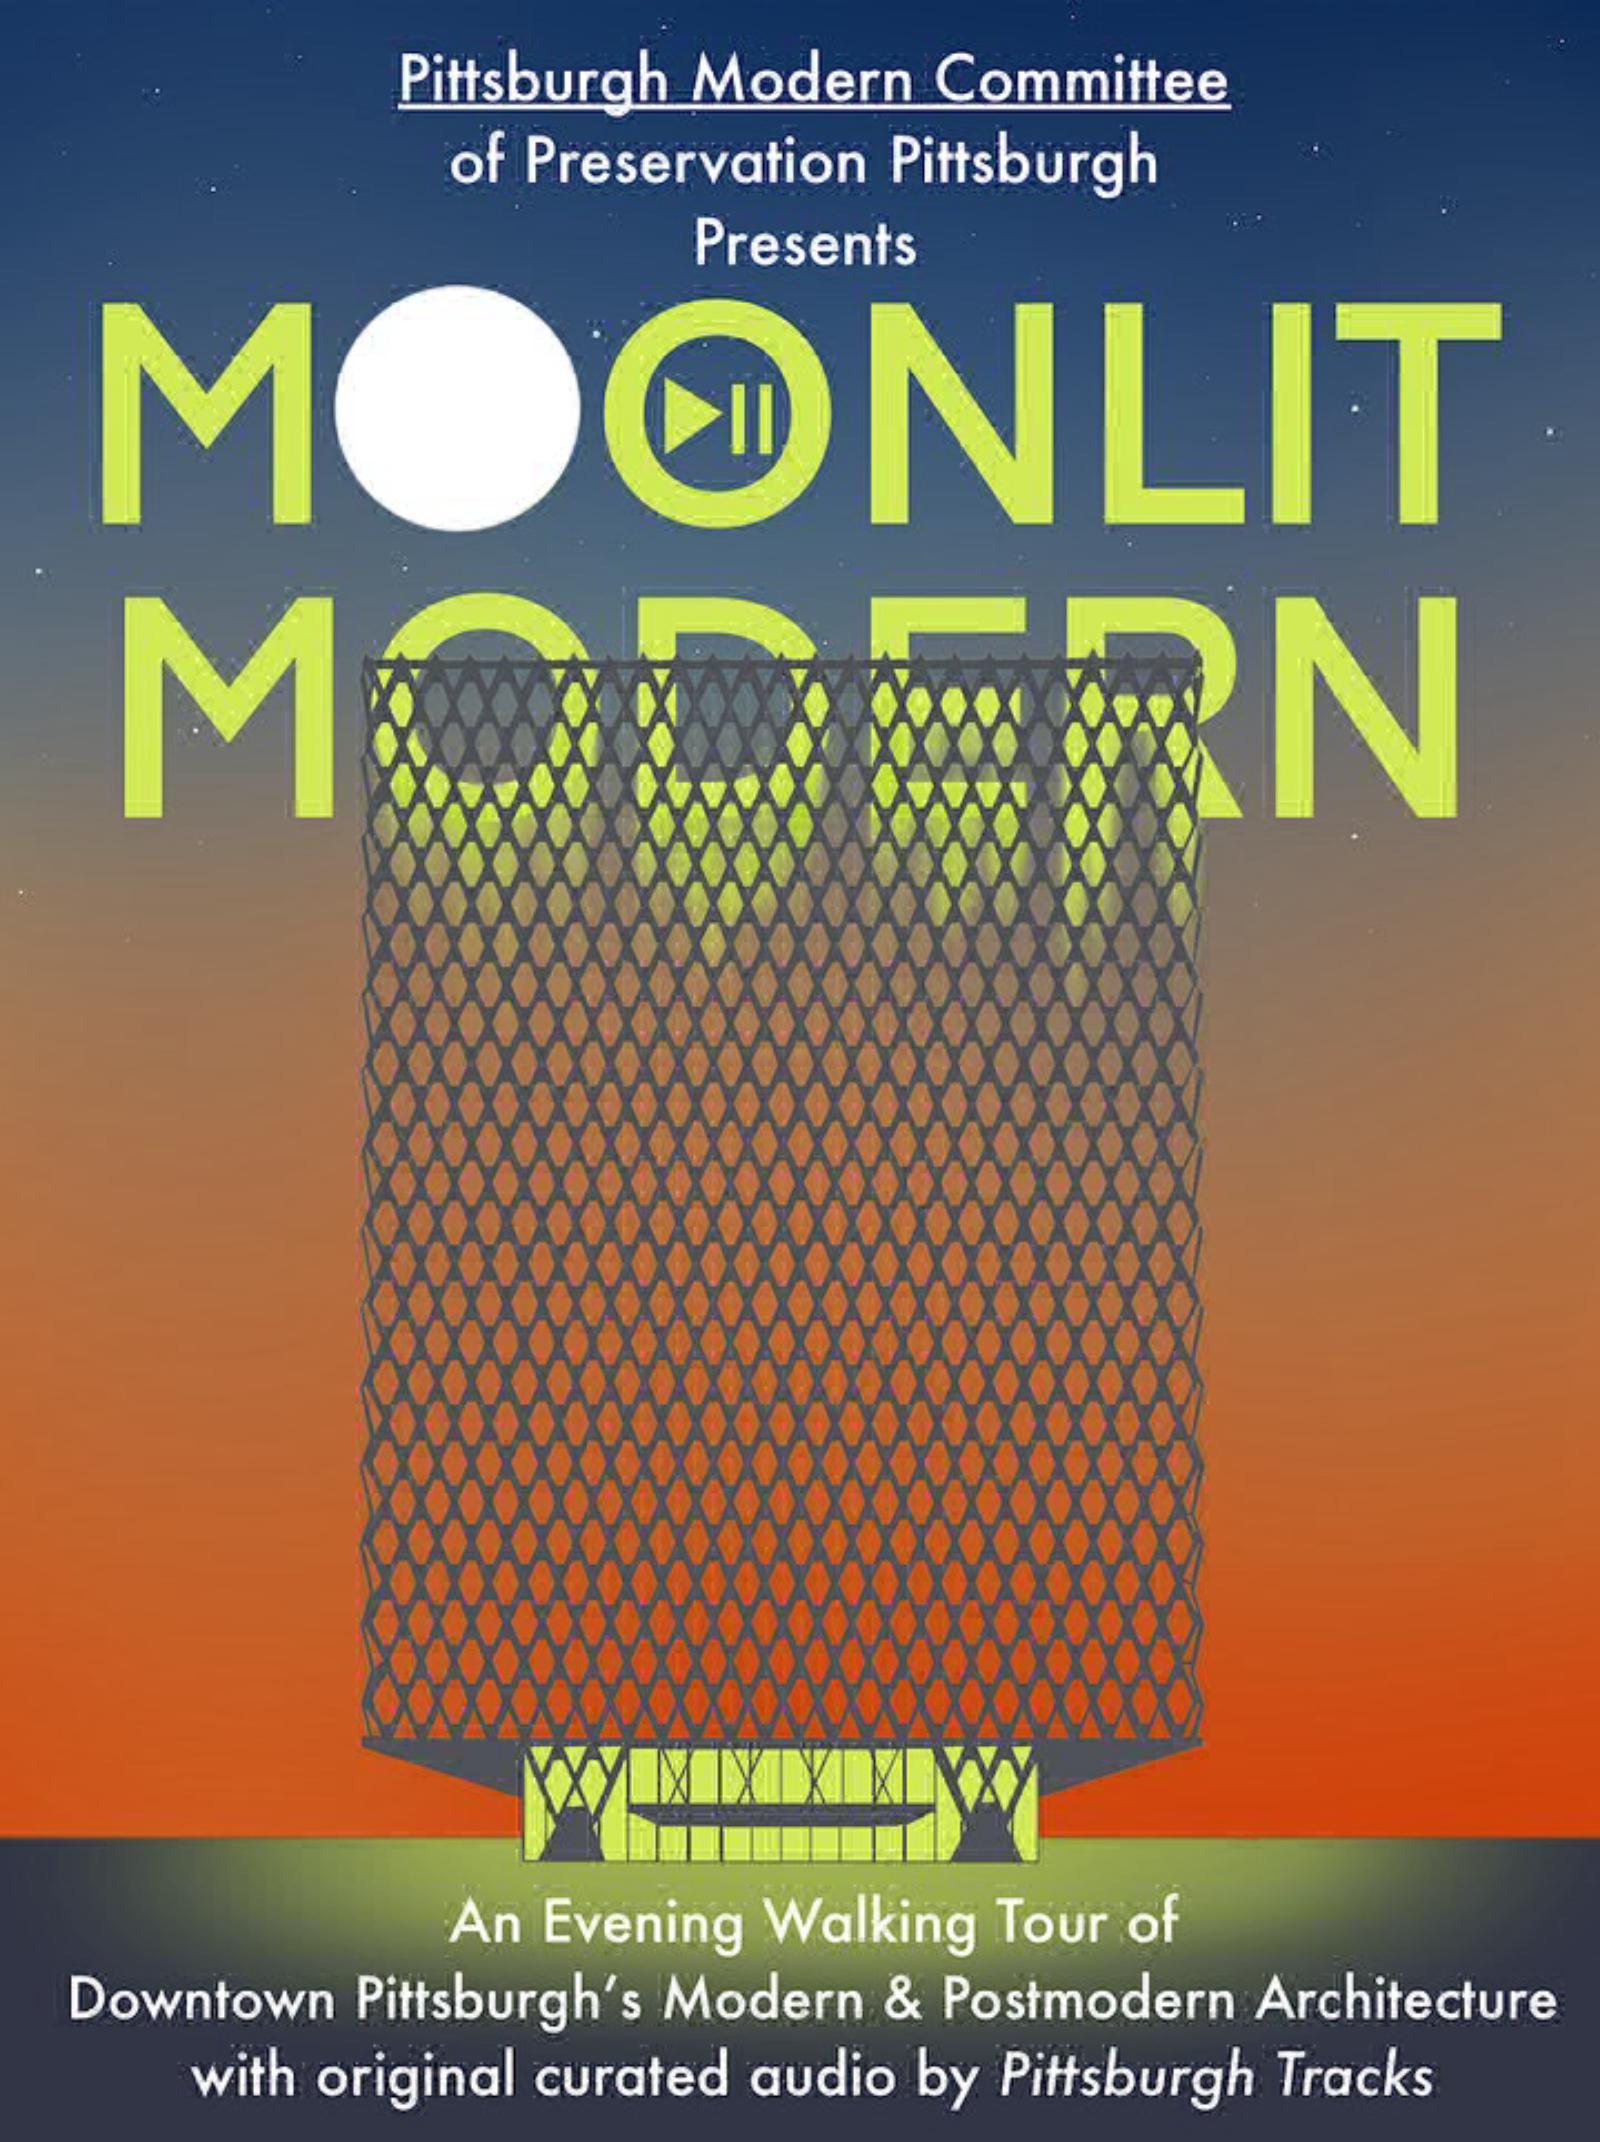 moonlit modern